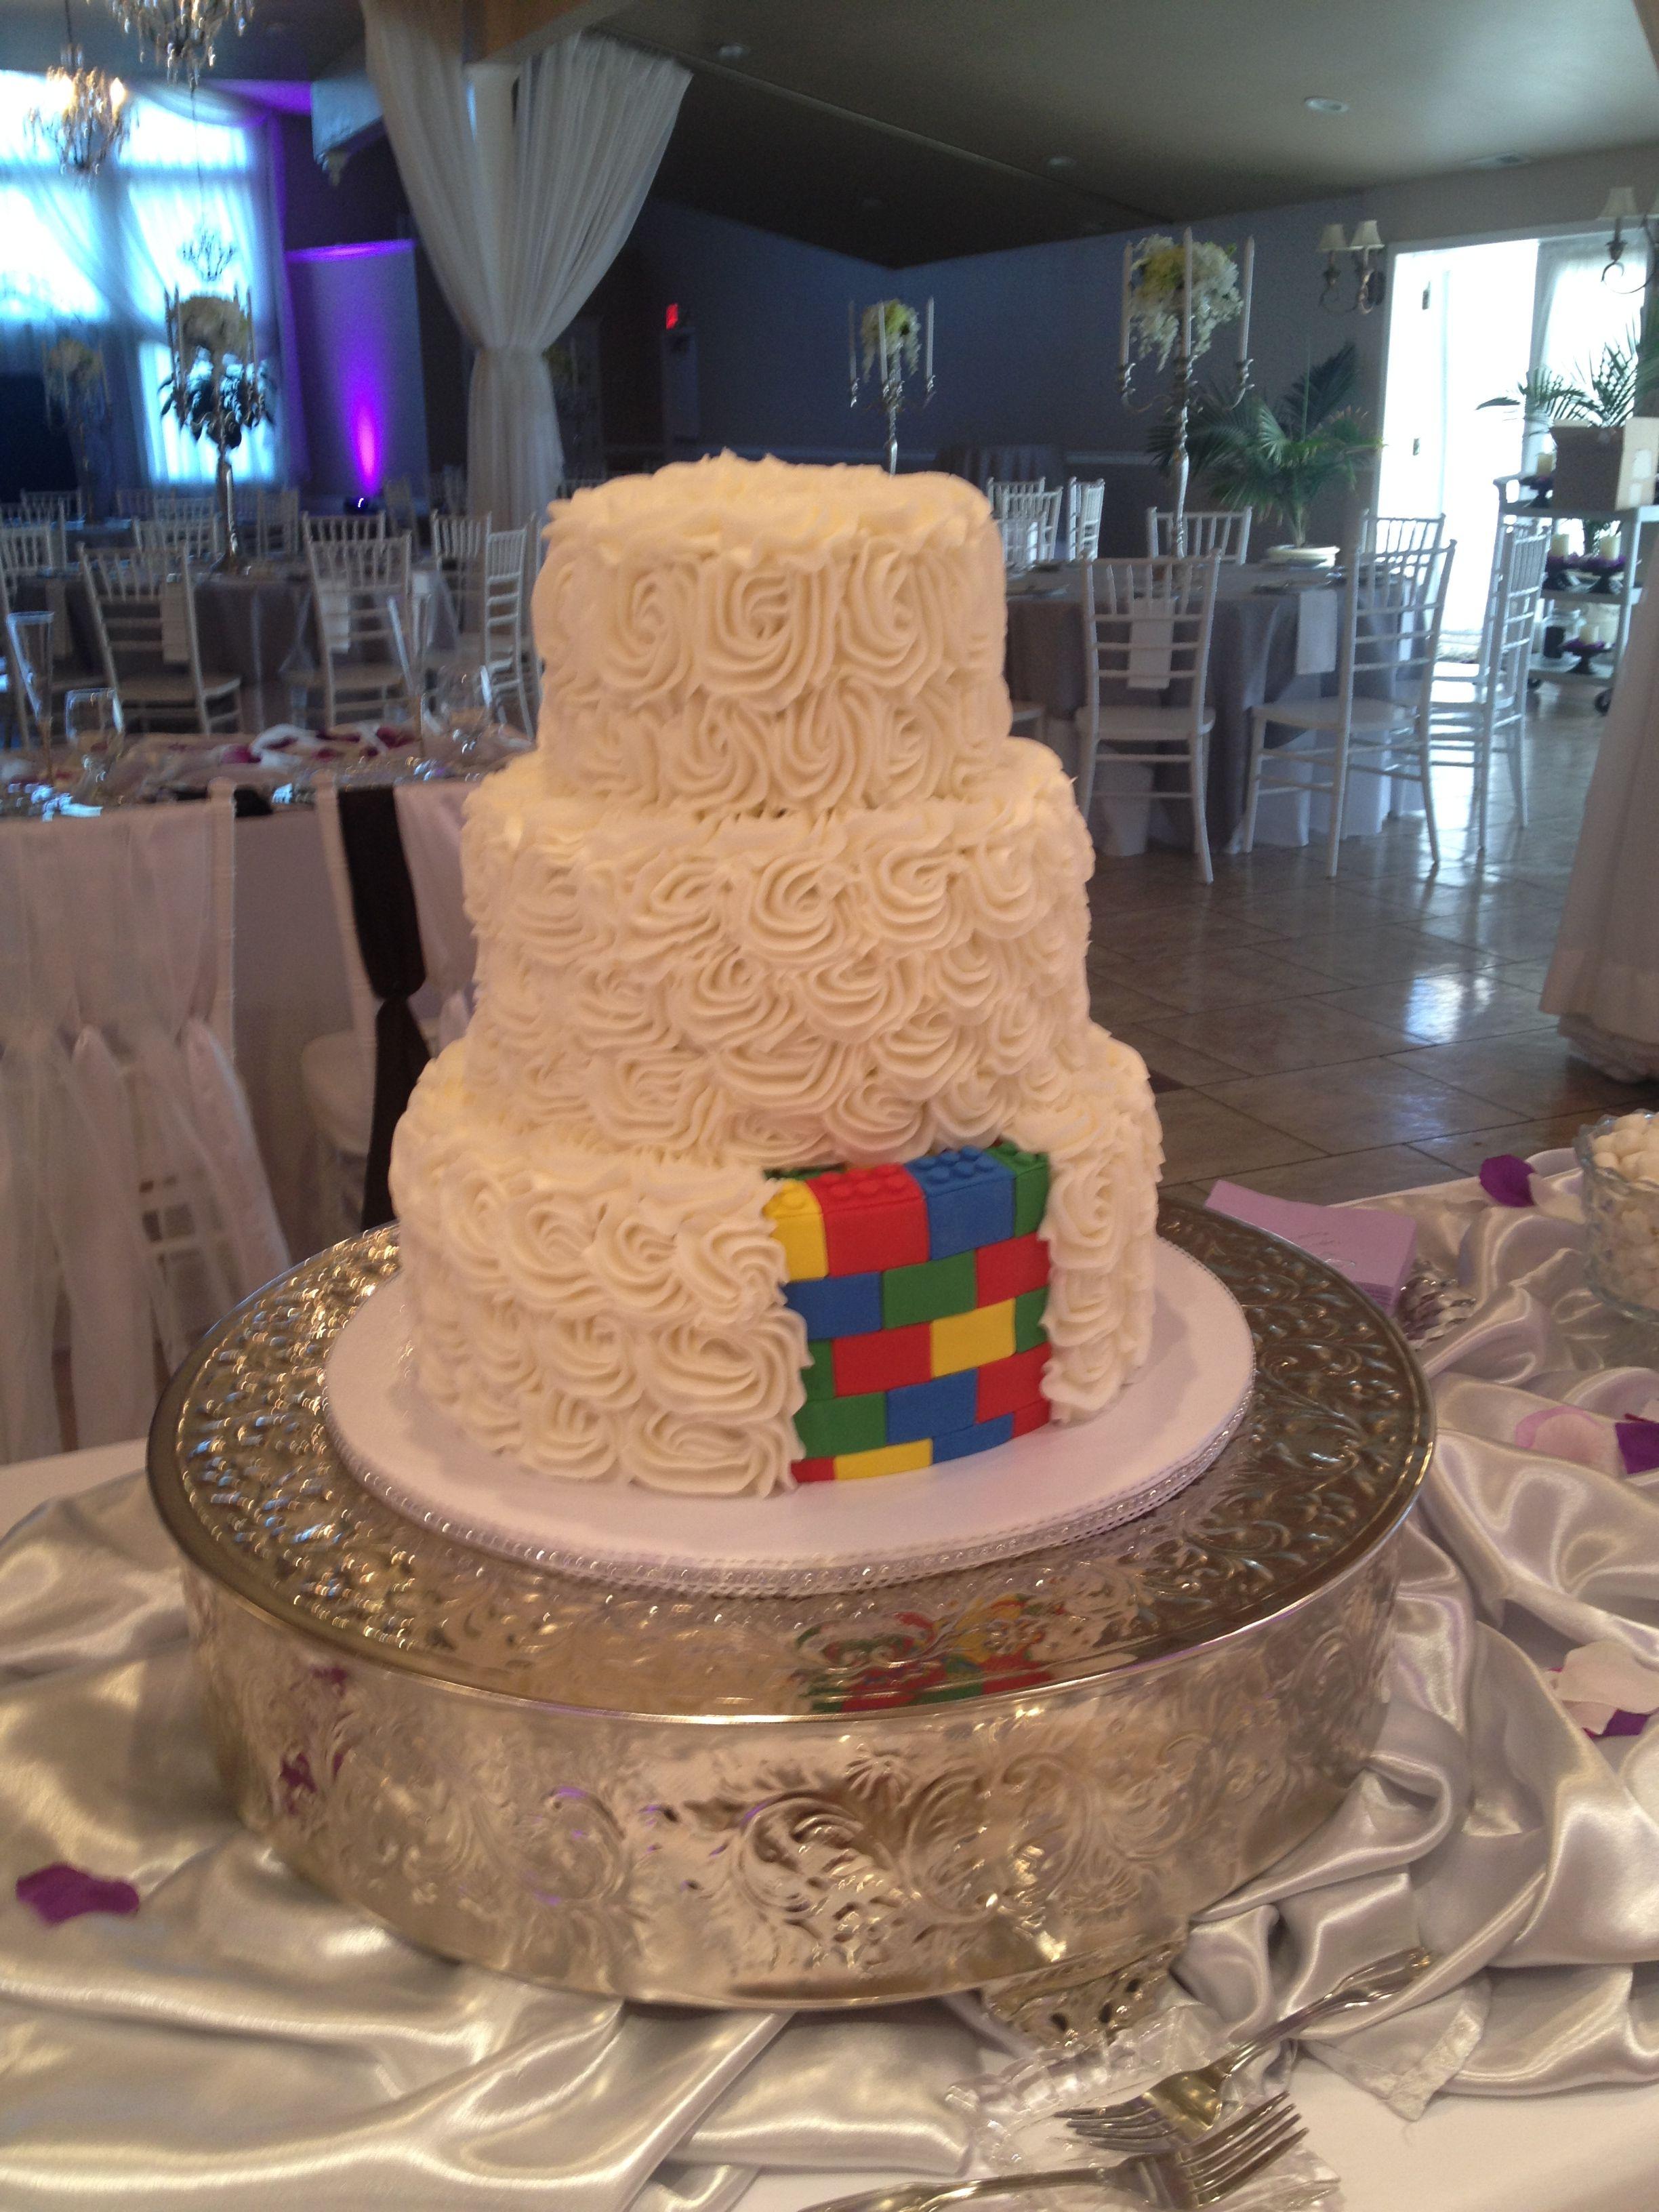 Tall Lego Wedding Cake Lego Hochzeitstorte Hochzeitstorte Lego